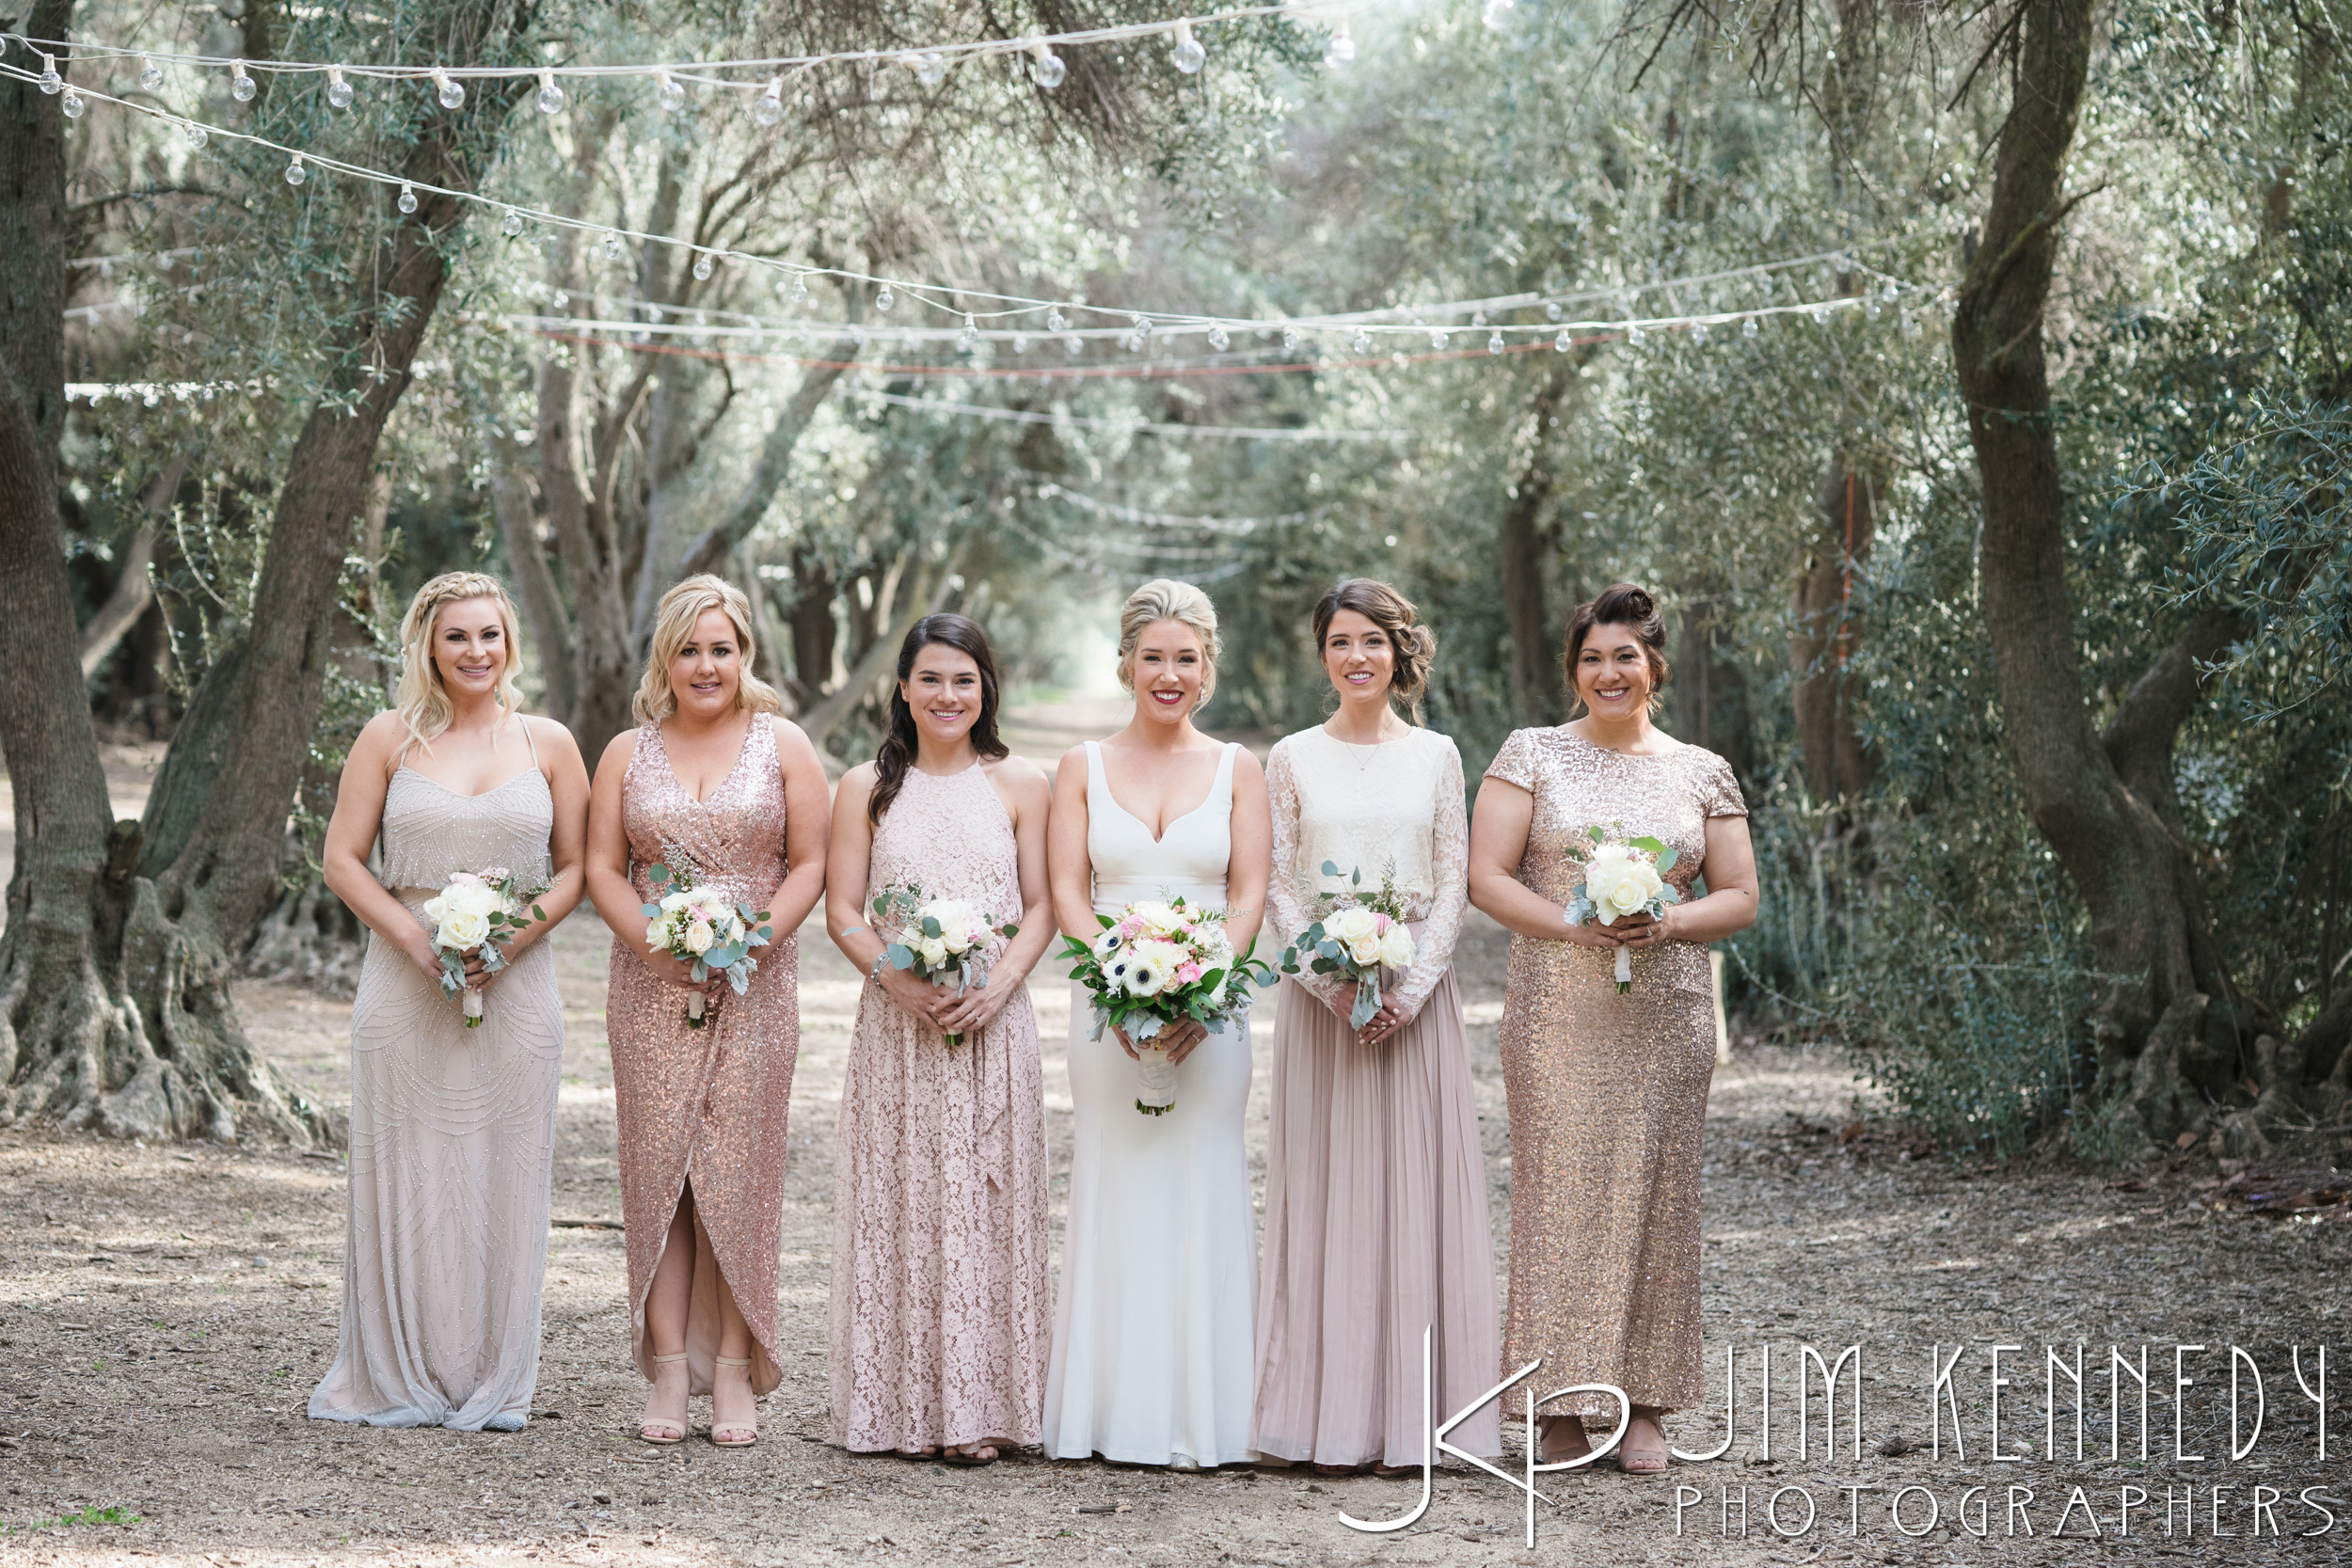 jim_kennedy_photographers_highland_springs_wedding_caitlyn_0060.jpg